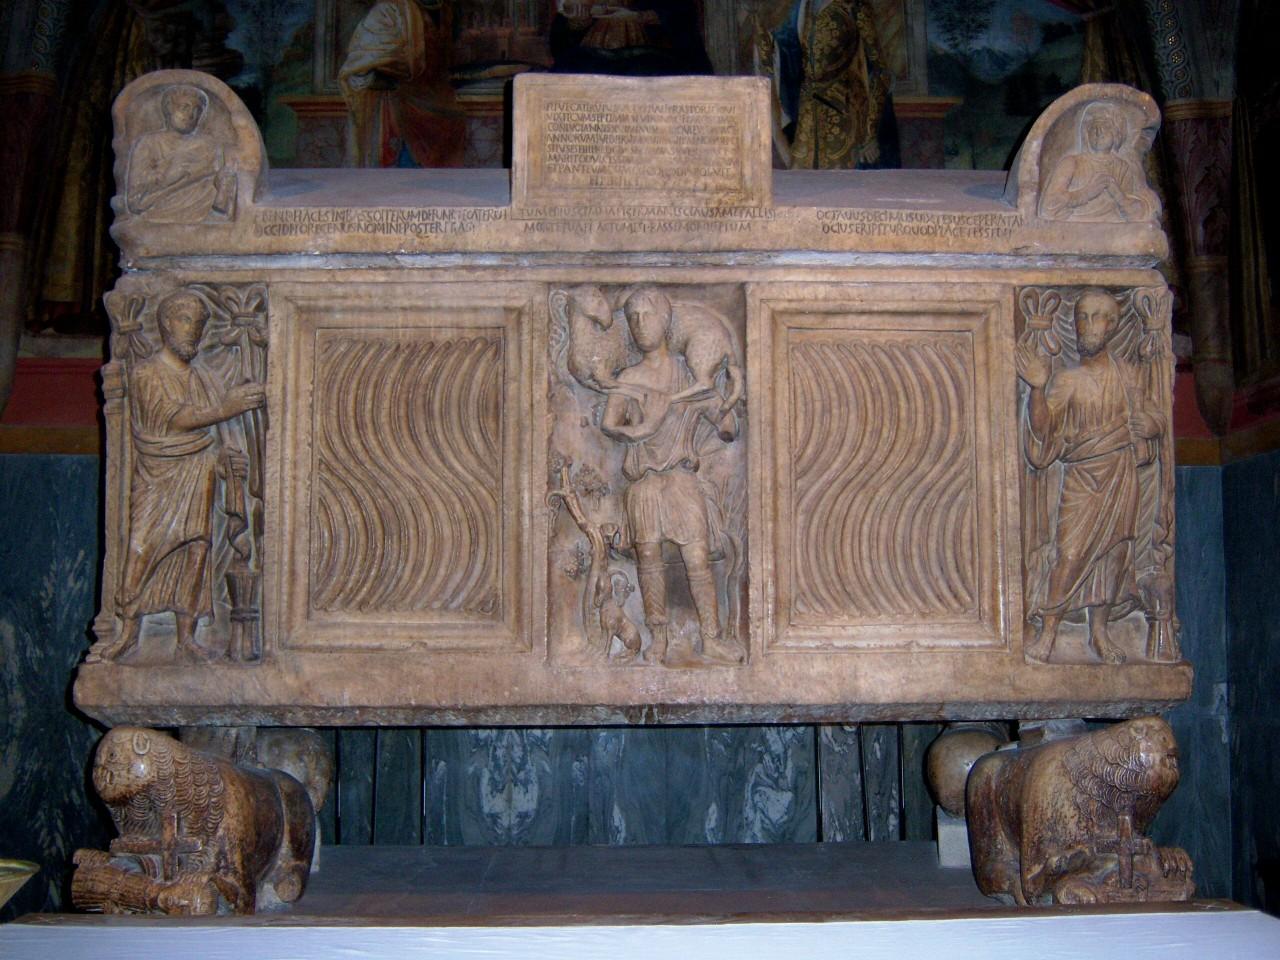 Catervus' sarkofag